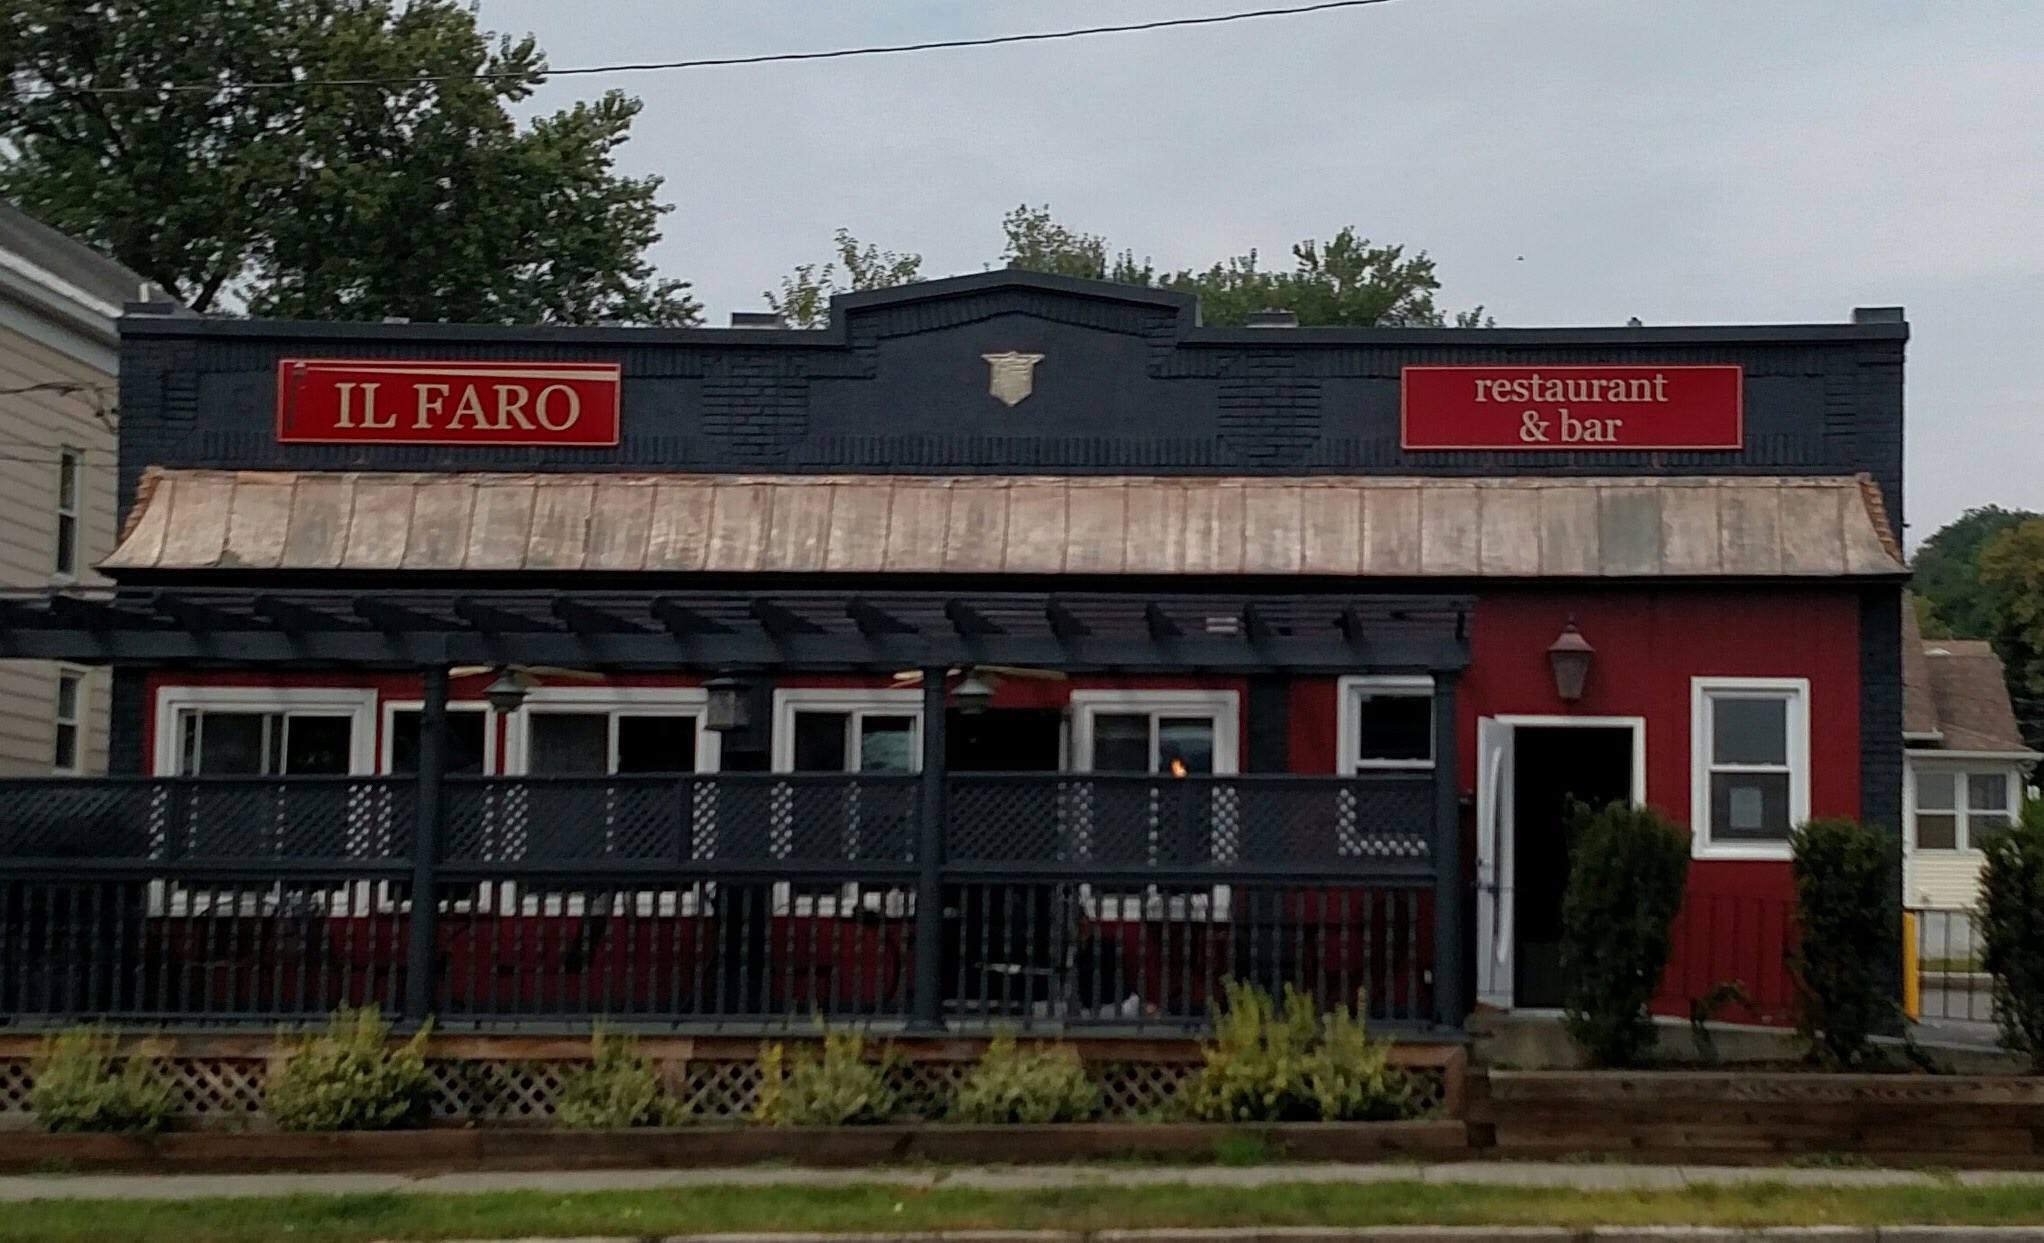 IL Faro Restaurant & Bar image 3